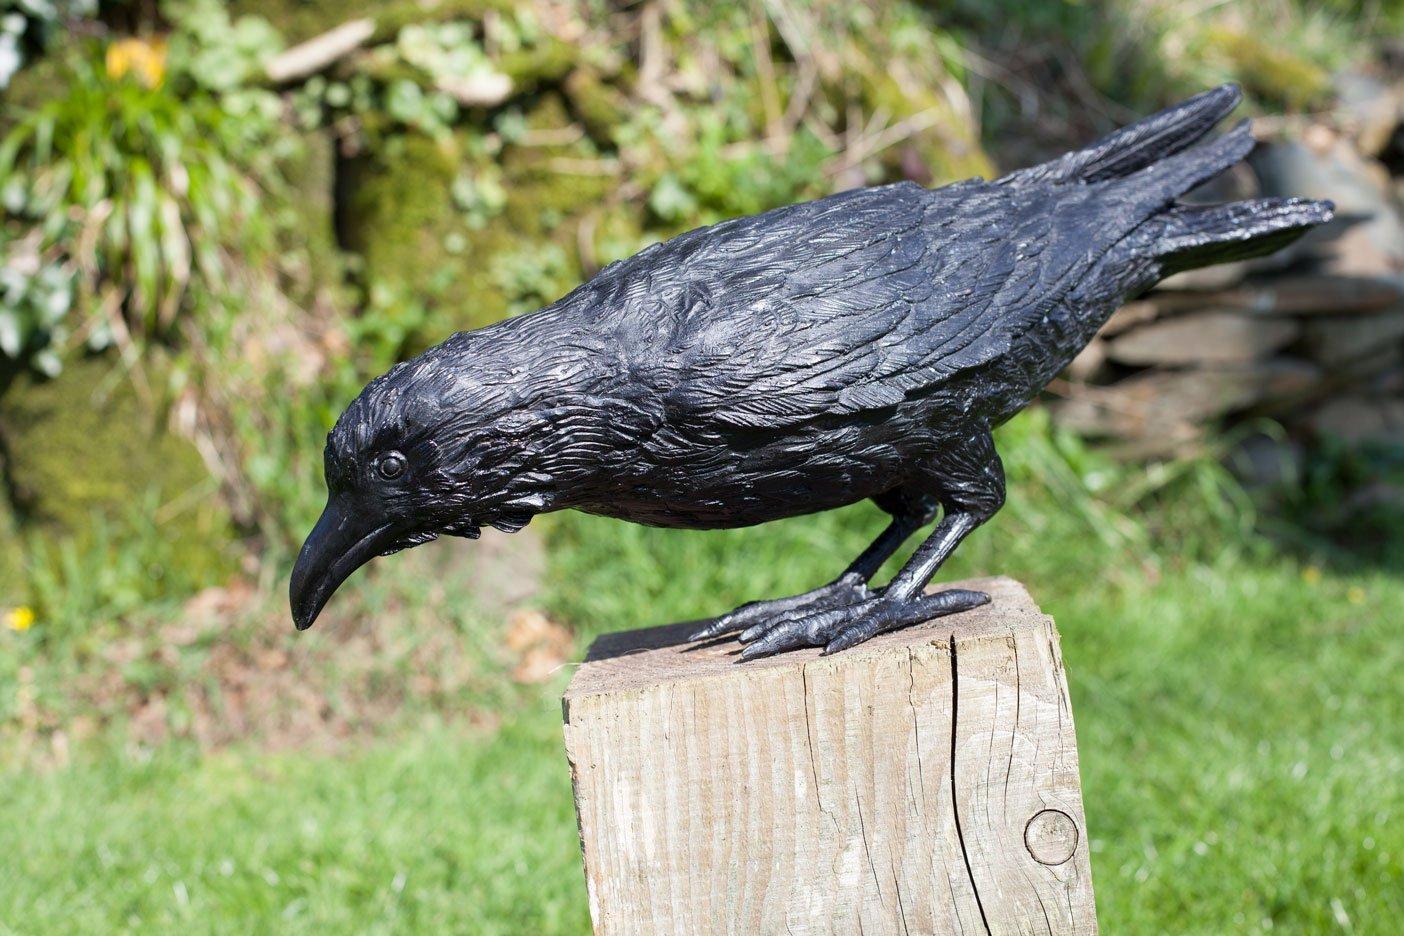 bronze crow pecking beak closed